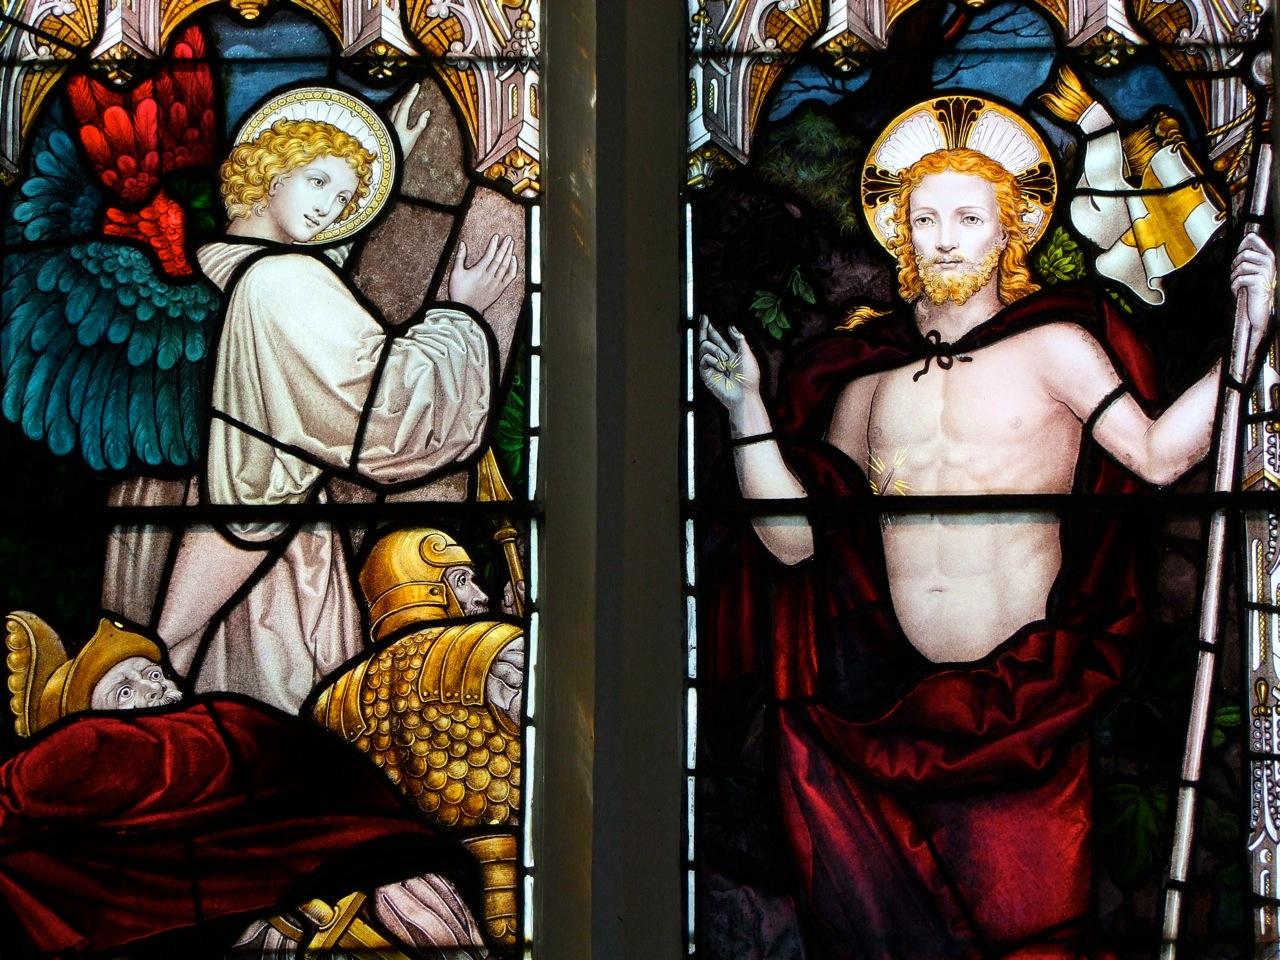 Jésus ressuscité -   Resurrection by Kempe  St Andrew West Wratting Cambridgeshire.jpg